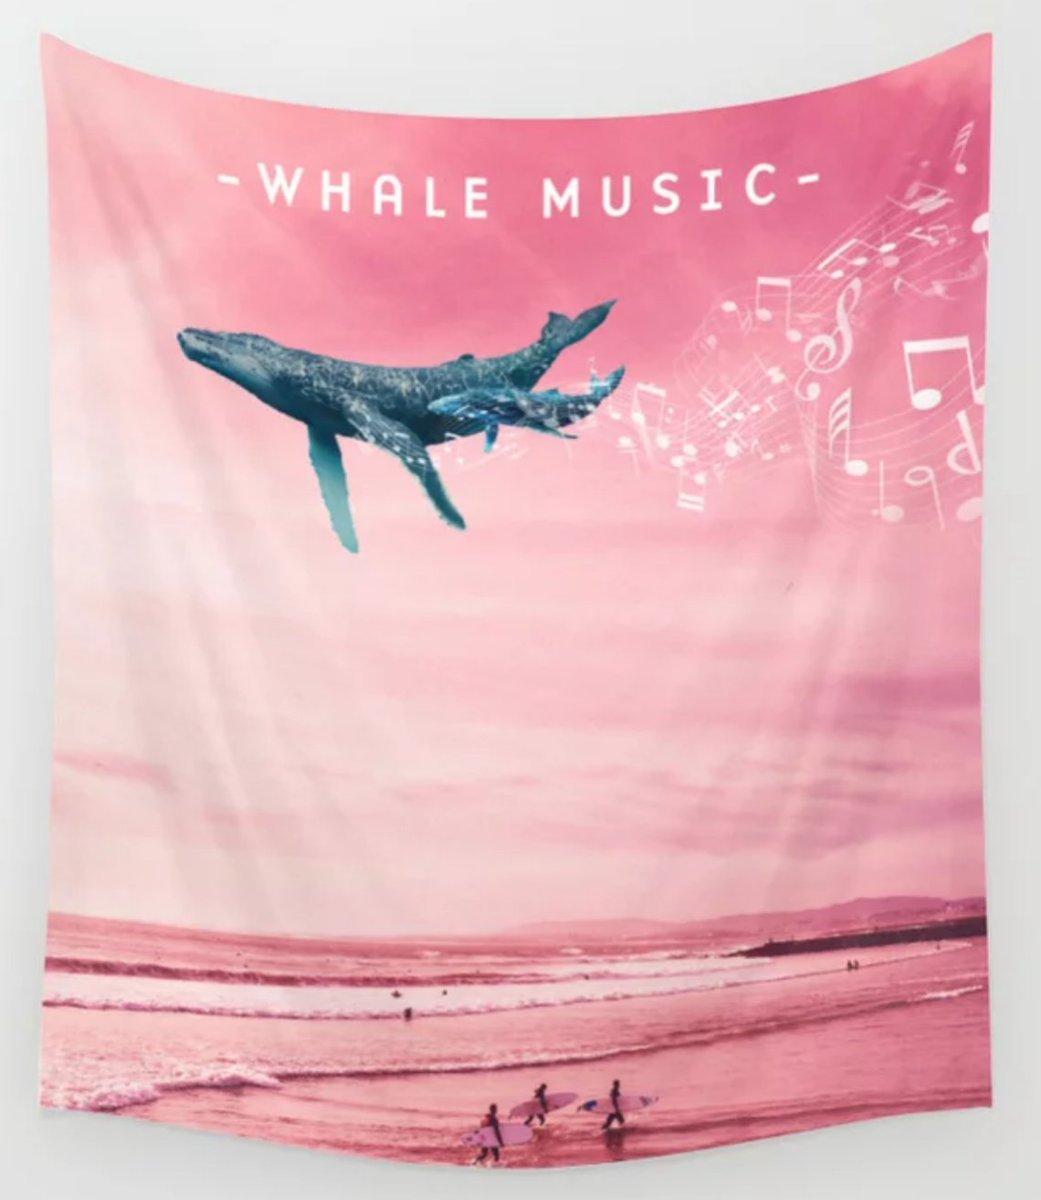 Get Some Whale Music, Now at my #Society6 #Shop Here is the link https://t.co/X1PlrK0OUt  #wallart #tropical  #art #prints #giants #art #wallart #artprints #giftideas #gift #kidsroom #homedecor #fish #beaches #tropicalfish #fantasyart #dormroom #whales #surf https://t.co/Pzkn2Fl78b